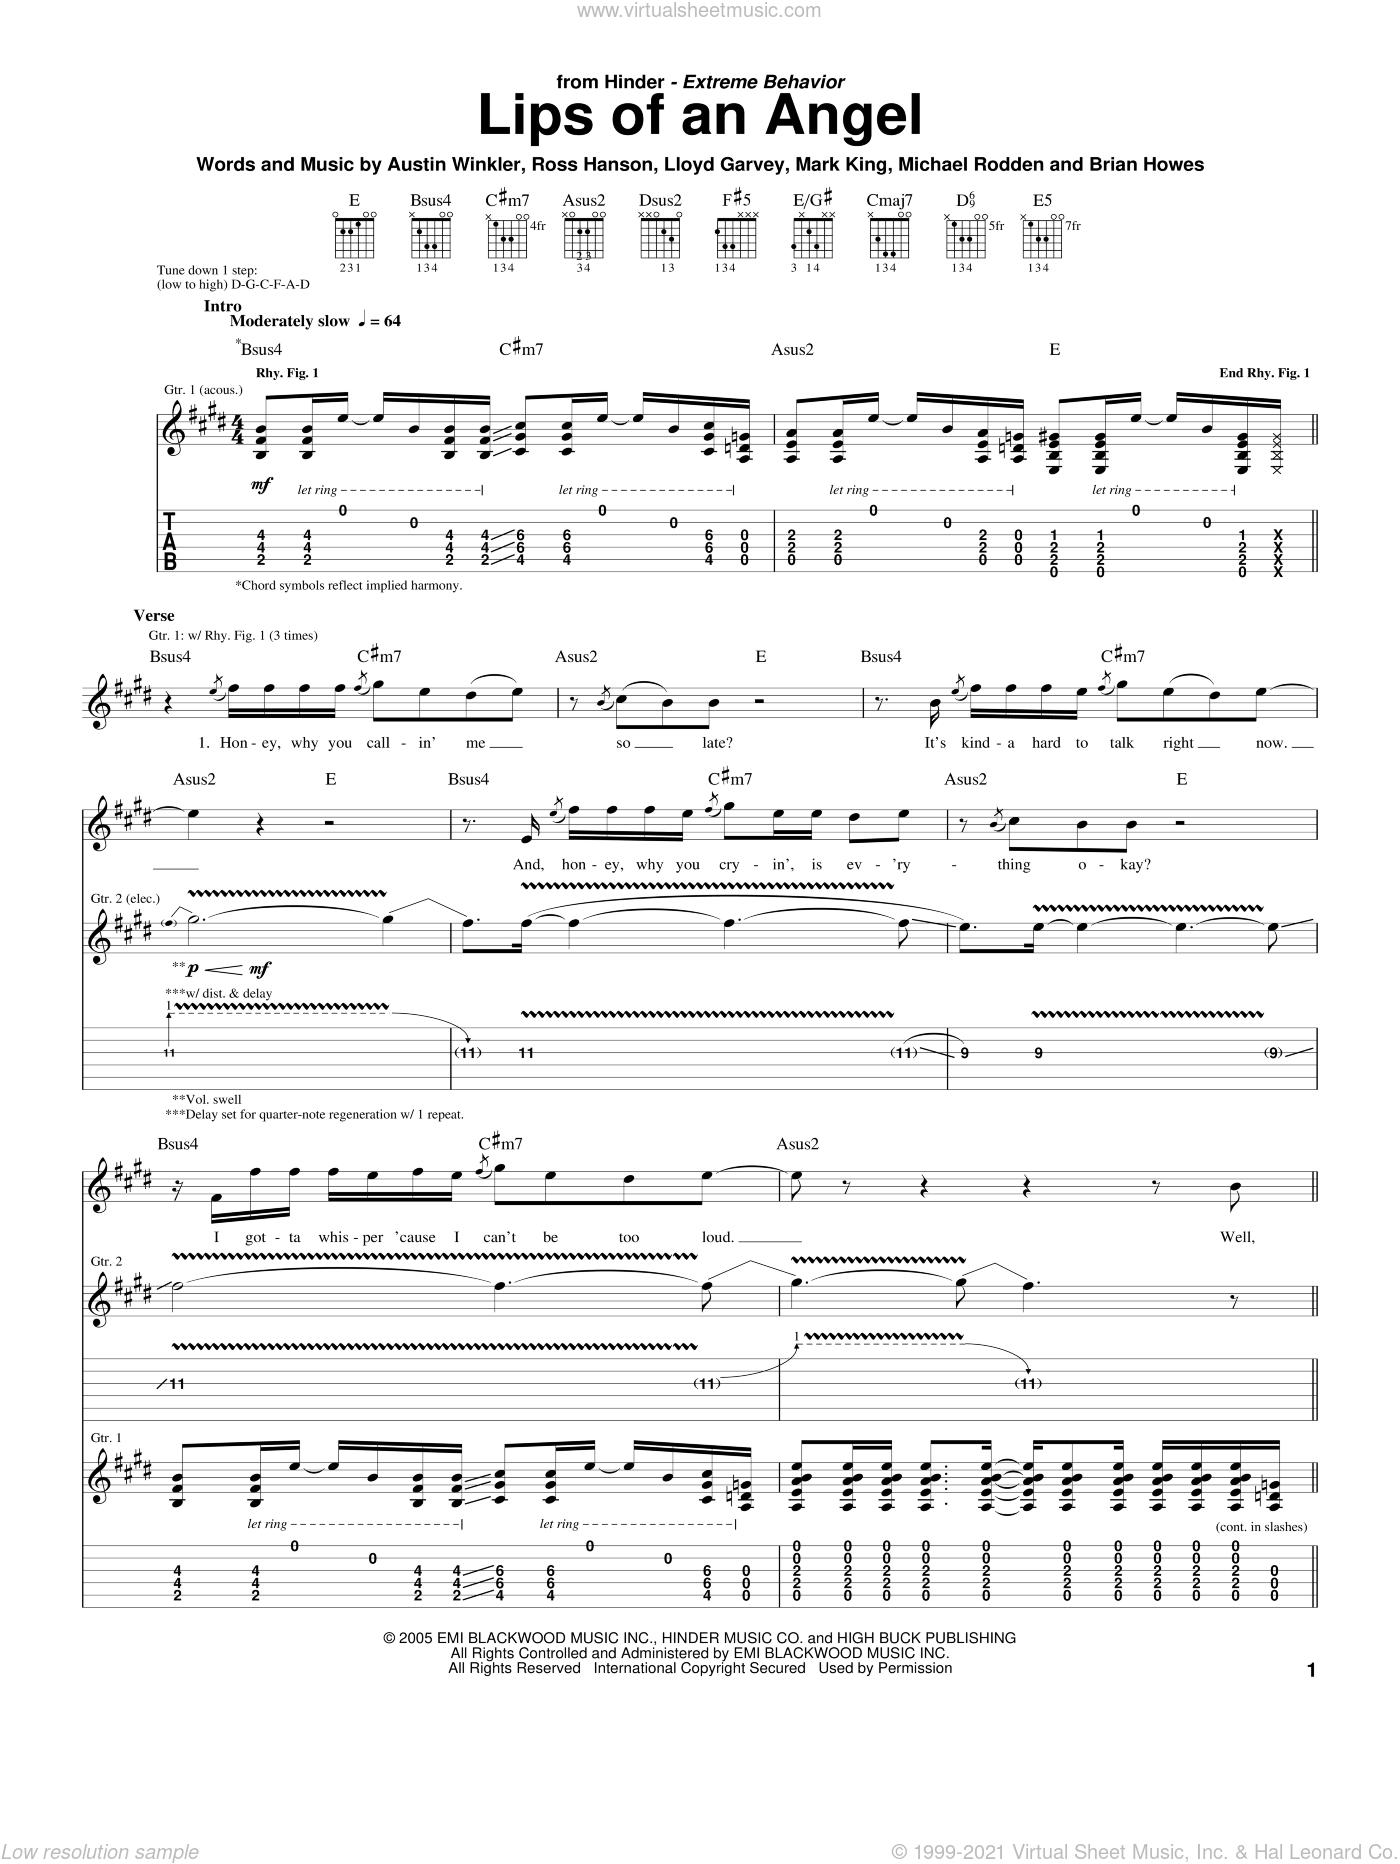 Lips Of An Angel sheet music for guitar (tablature) by Hinder, Austin Winkler, Brian Howes, Lloyd Garvey, Mark King, Michael Rodden and Ross Hanson, intermediate skill level